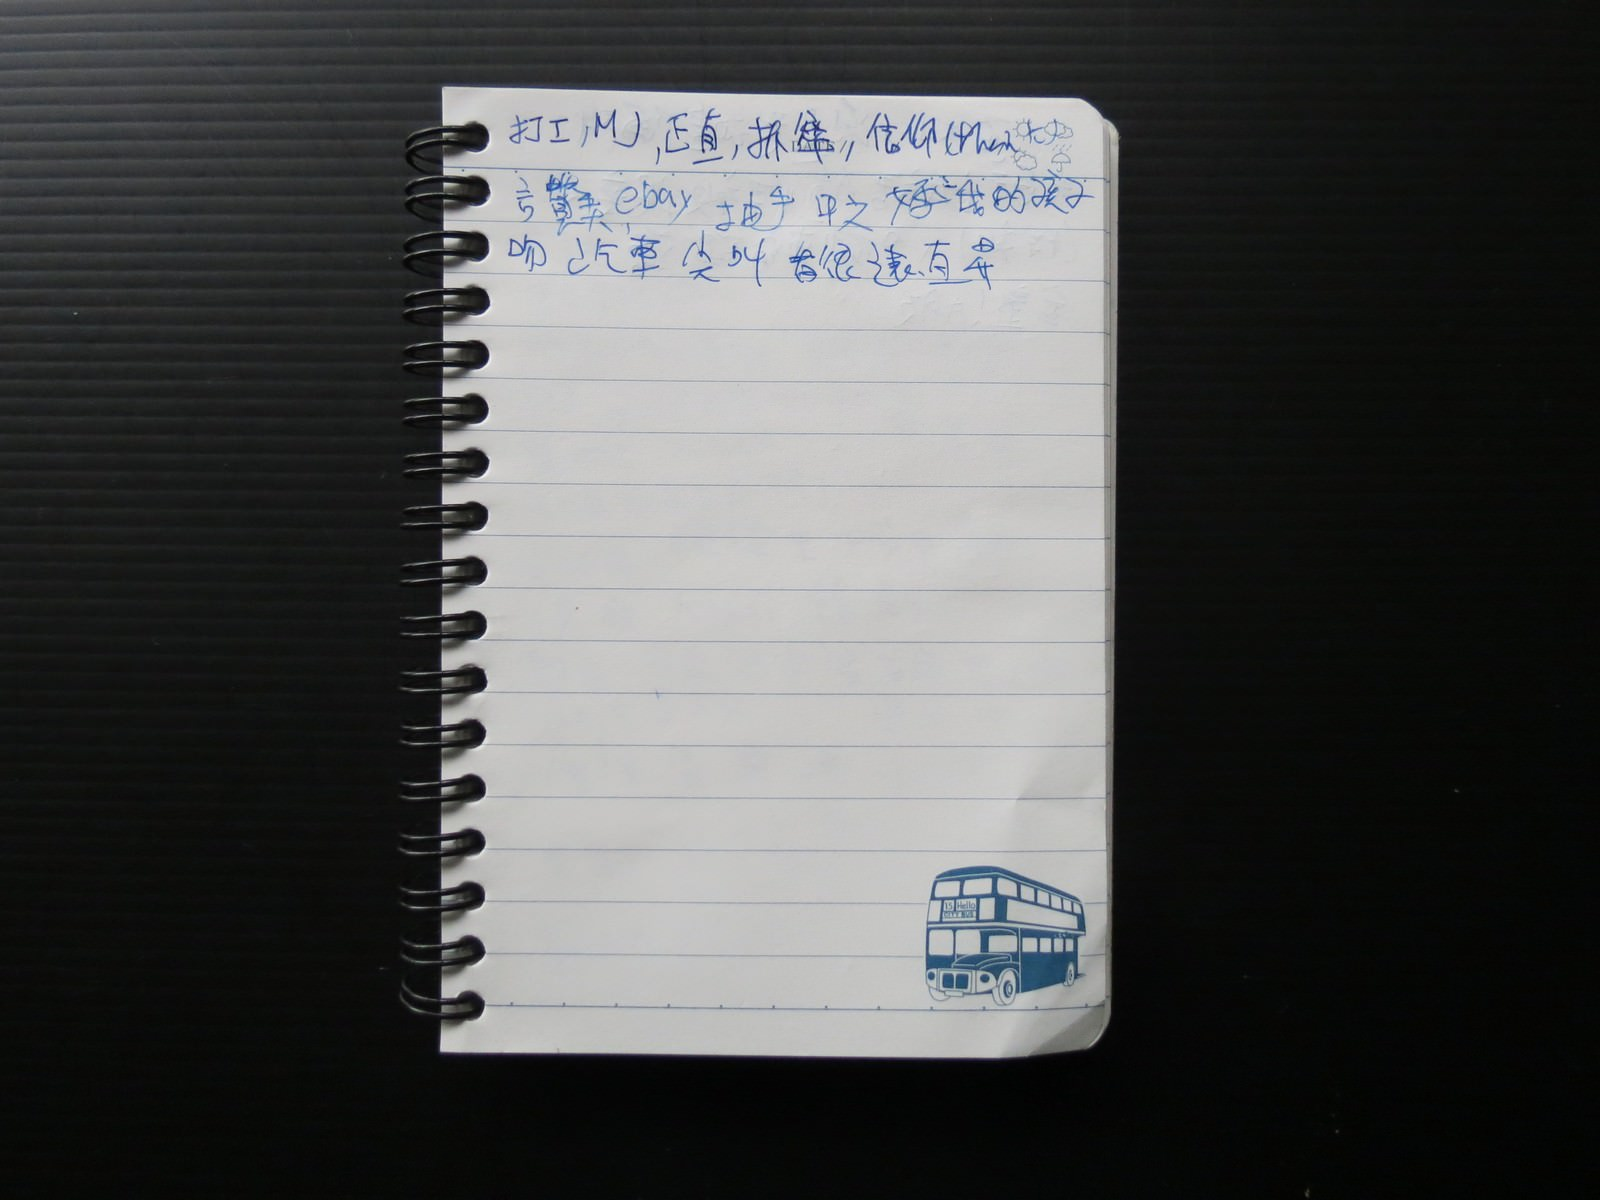 Movie, Spider-Man 2(美國, 2004年) / 蜘蛛人2(台灣) / 蜘蛛侠2(中國) / 蜘蛛俠2(香港), 心得速記